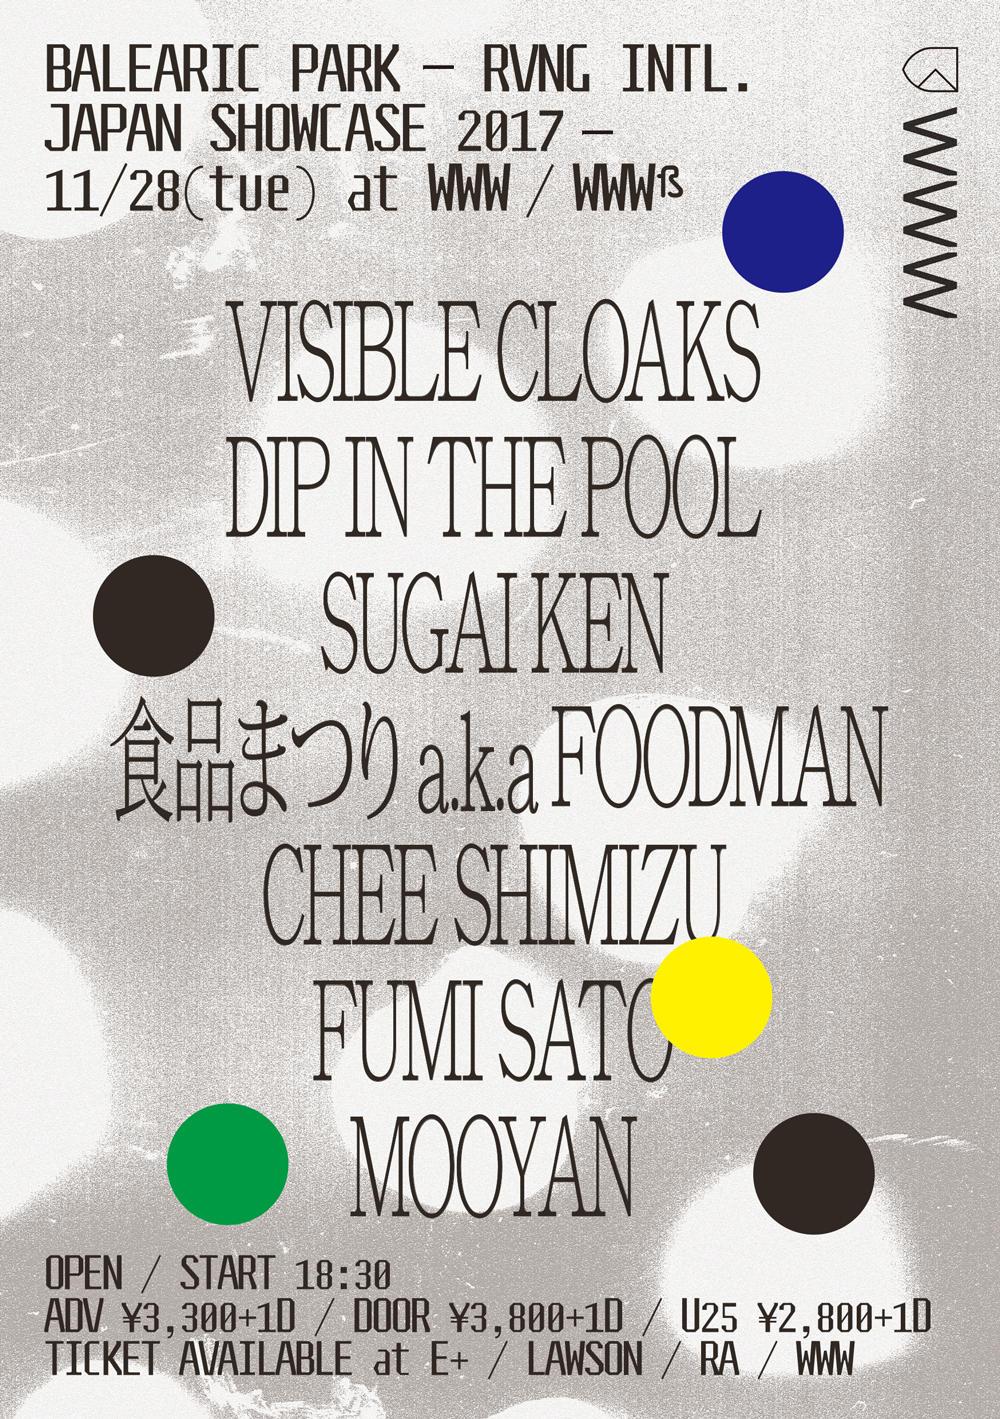 LIVE: Visible Cloaks / dip in the pool / SUGAI KEN / 食品まつり a.k.a foodman DJ: Chee Shimizu / FUMI SATO / mooyan